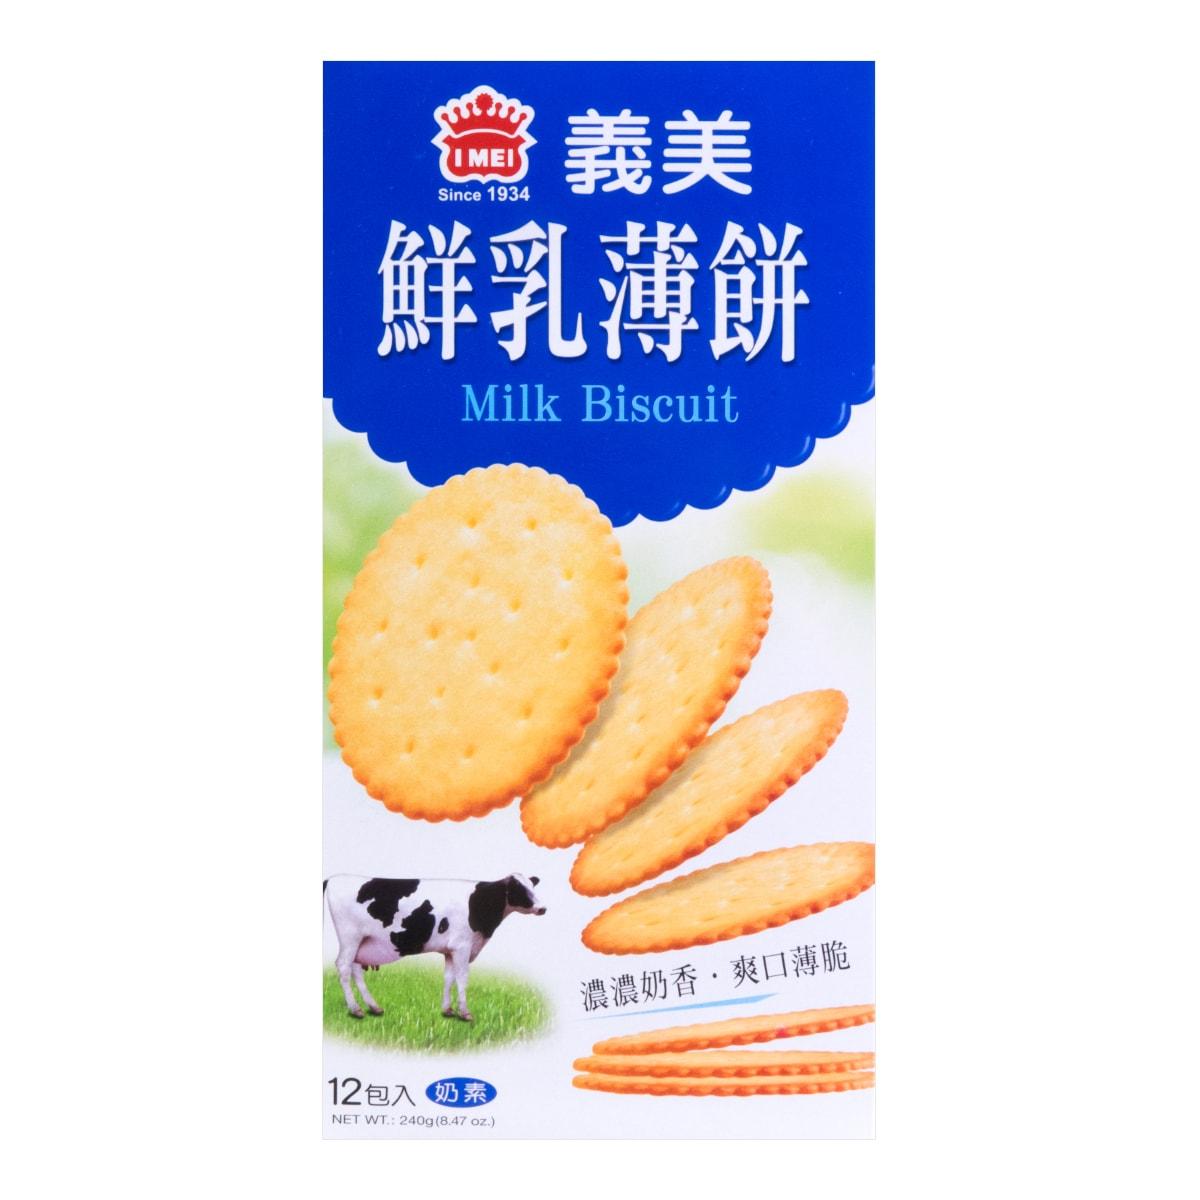 IMEI Milk Biscuit 12packs 240g